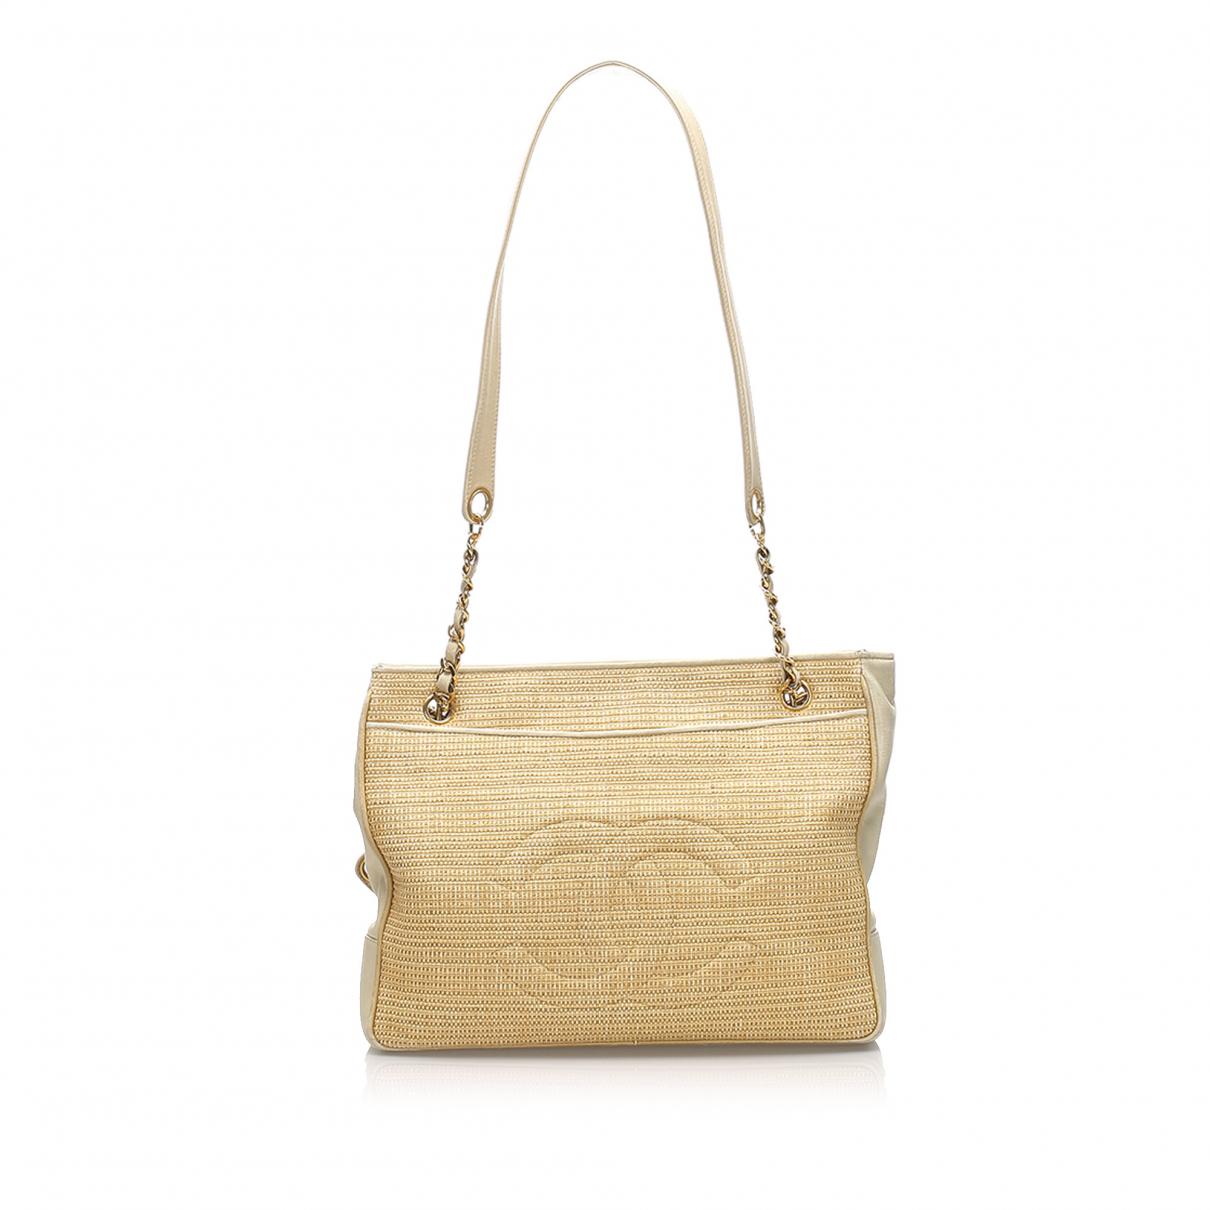 Chanel N Brown Leather handbag for Women N